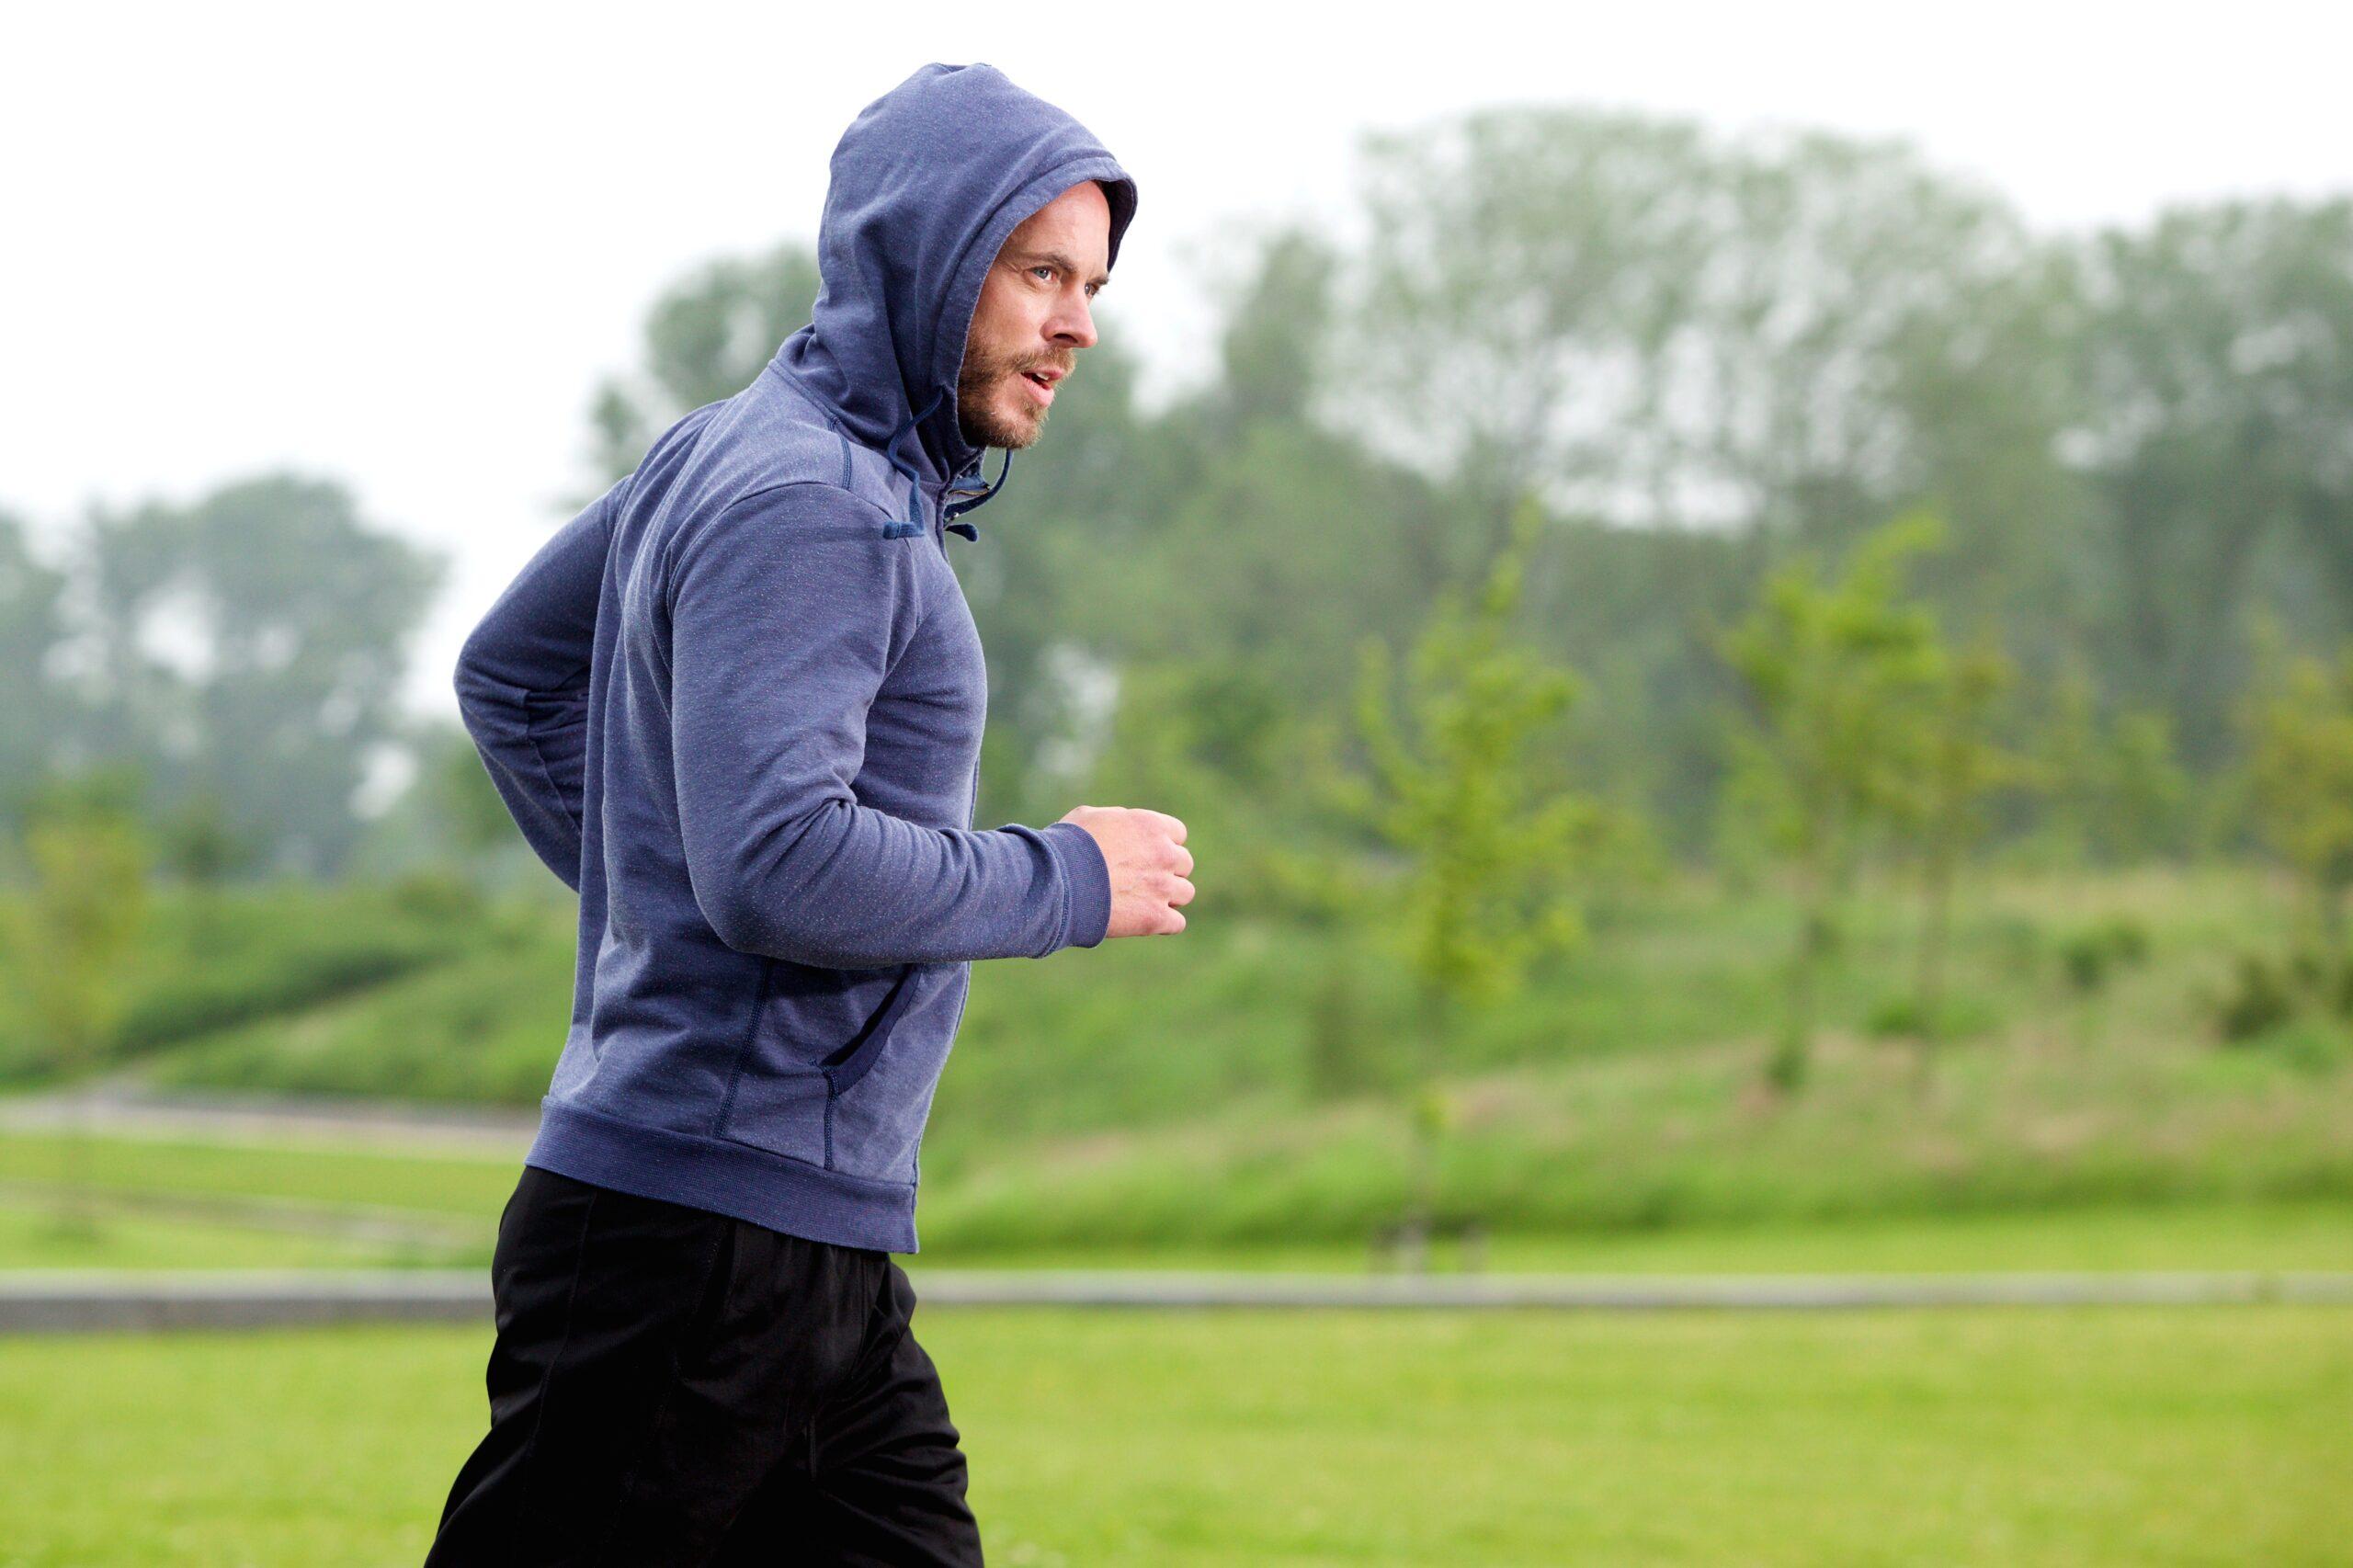 man running arthritis